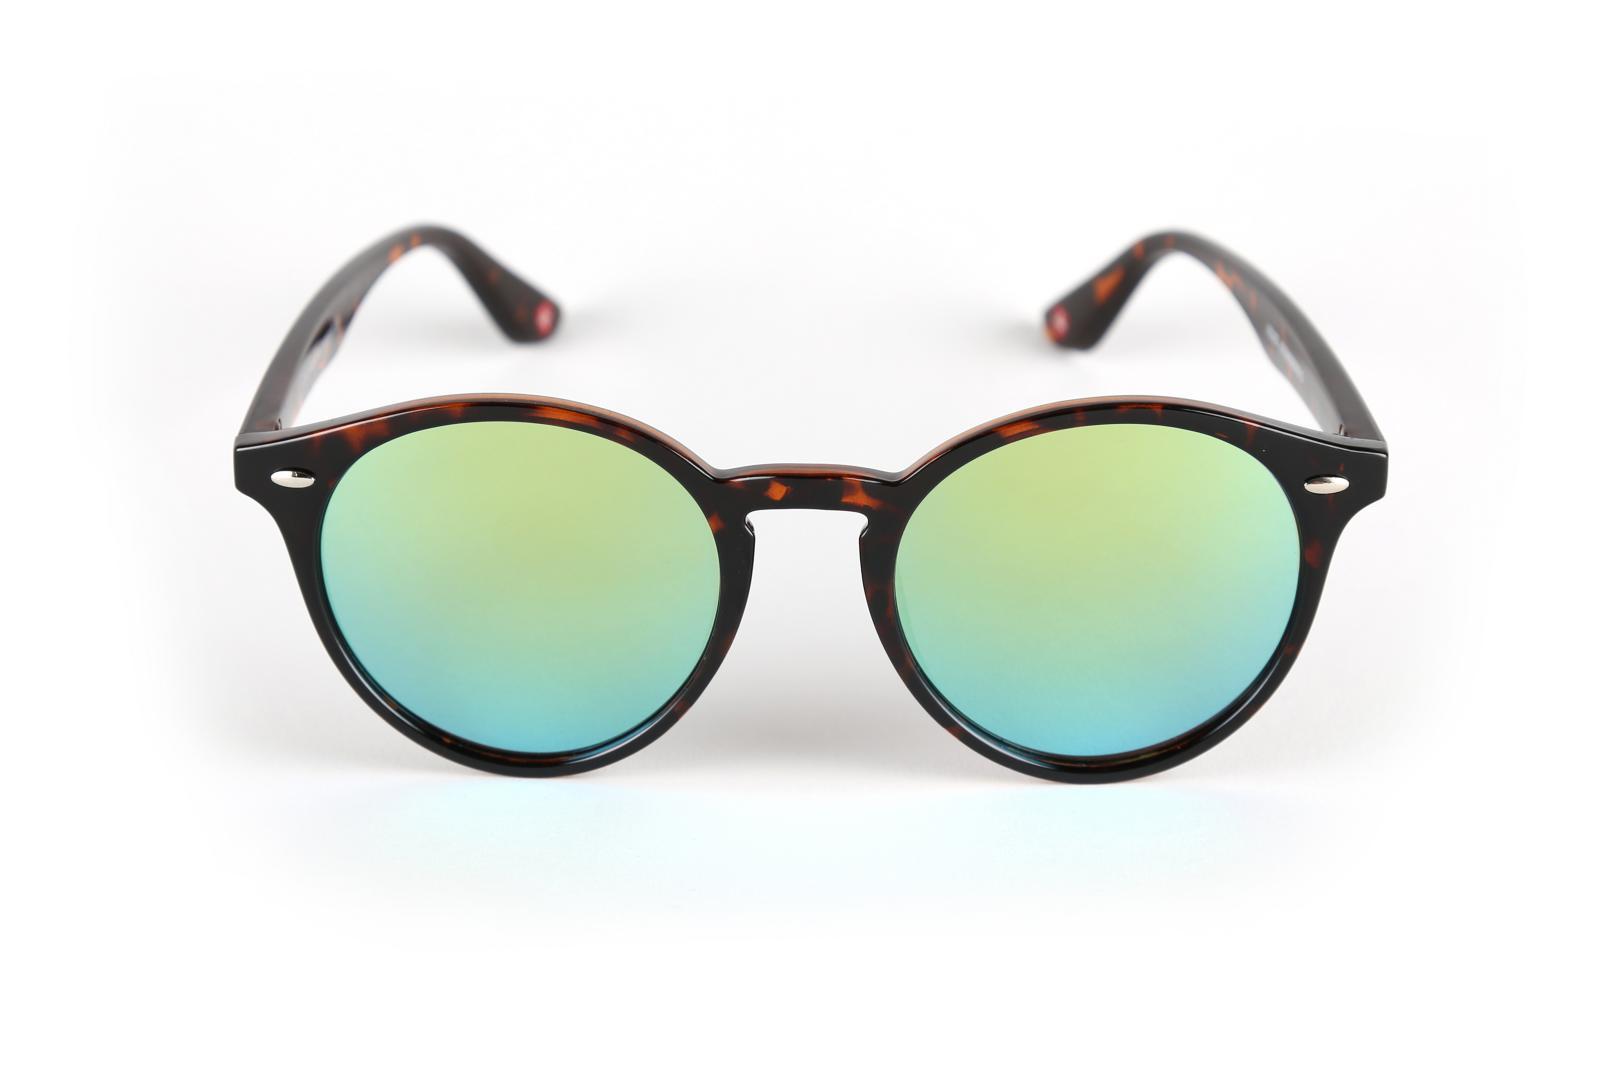 Montana Eyewear MS20-Havanna-Grün MzvCbD0q5